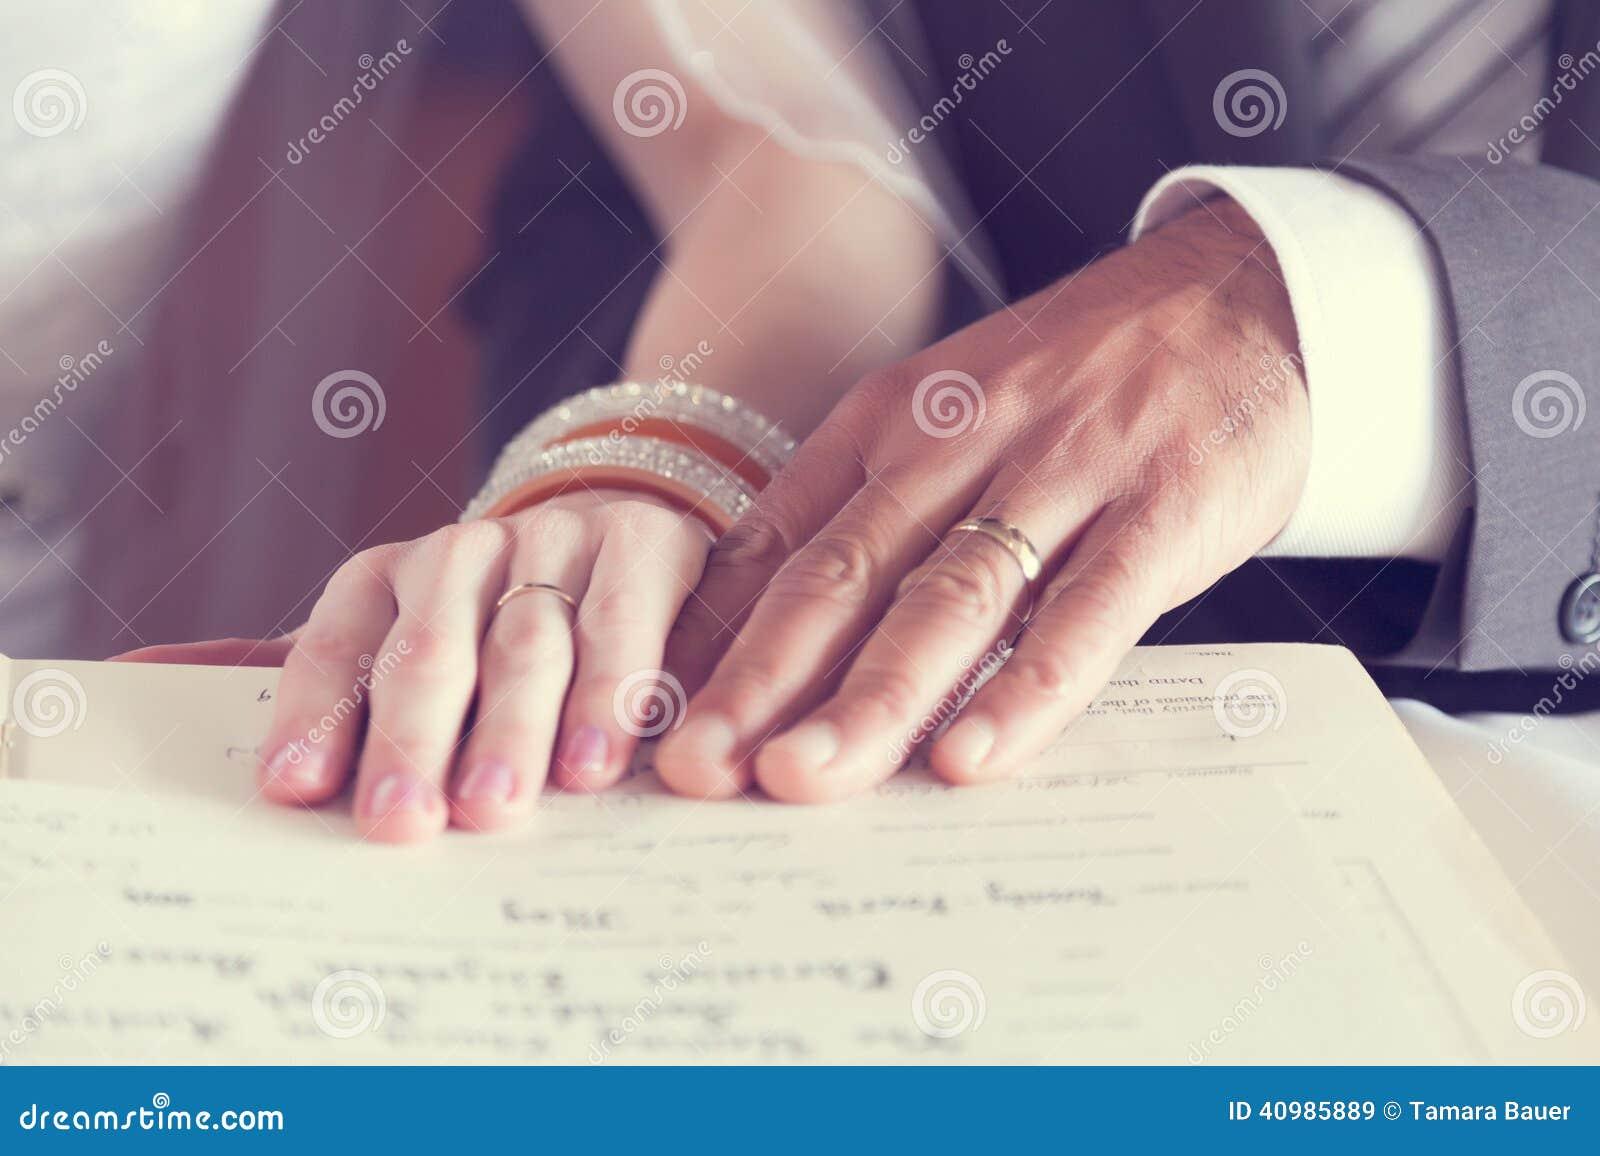 Wedding rings on hands stock image. Image of groom, rings - 40985889